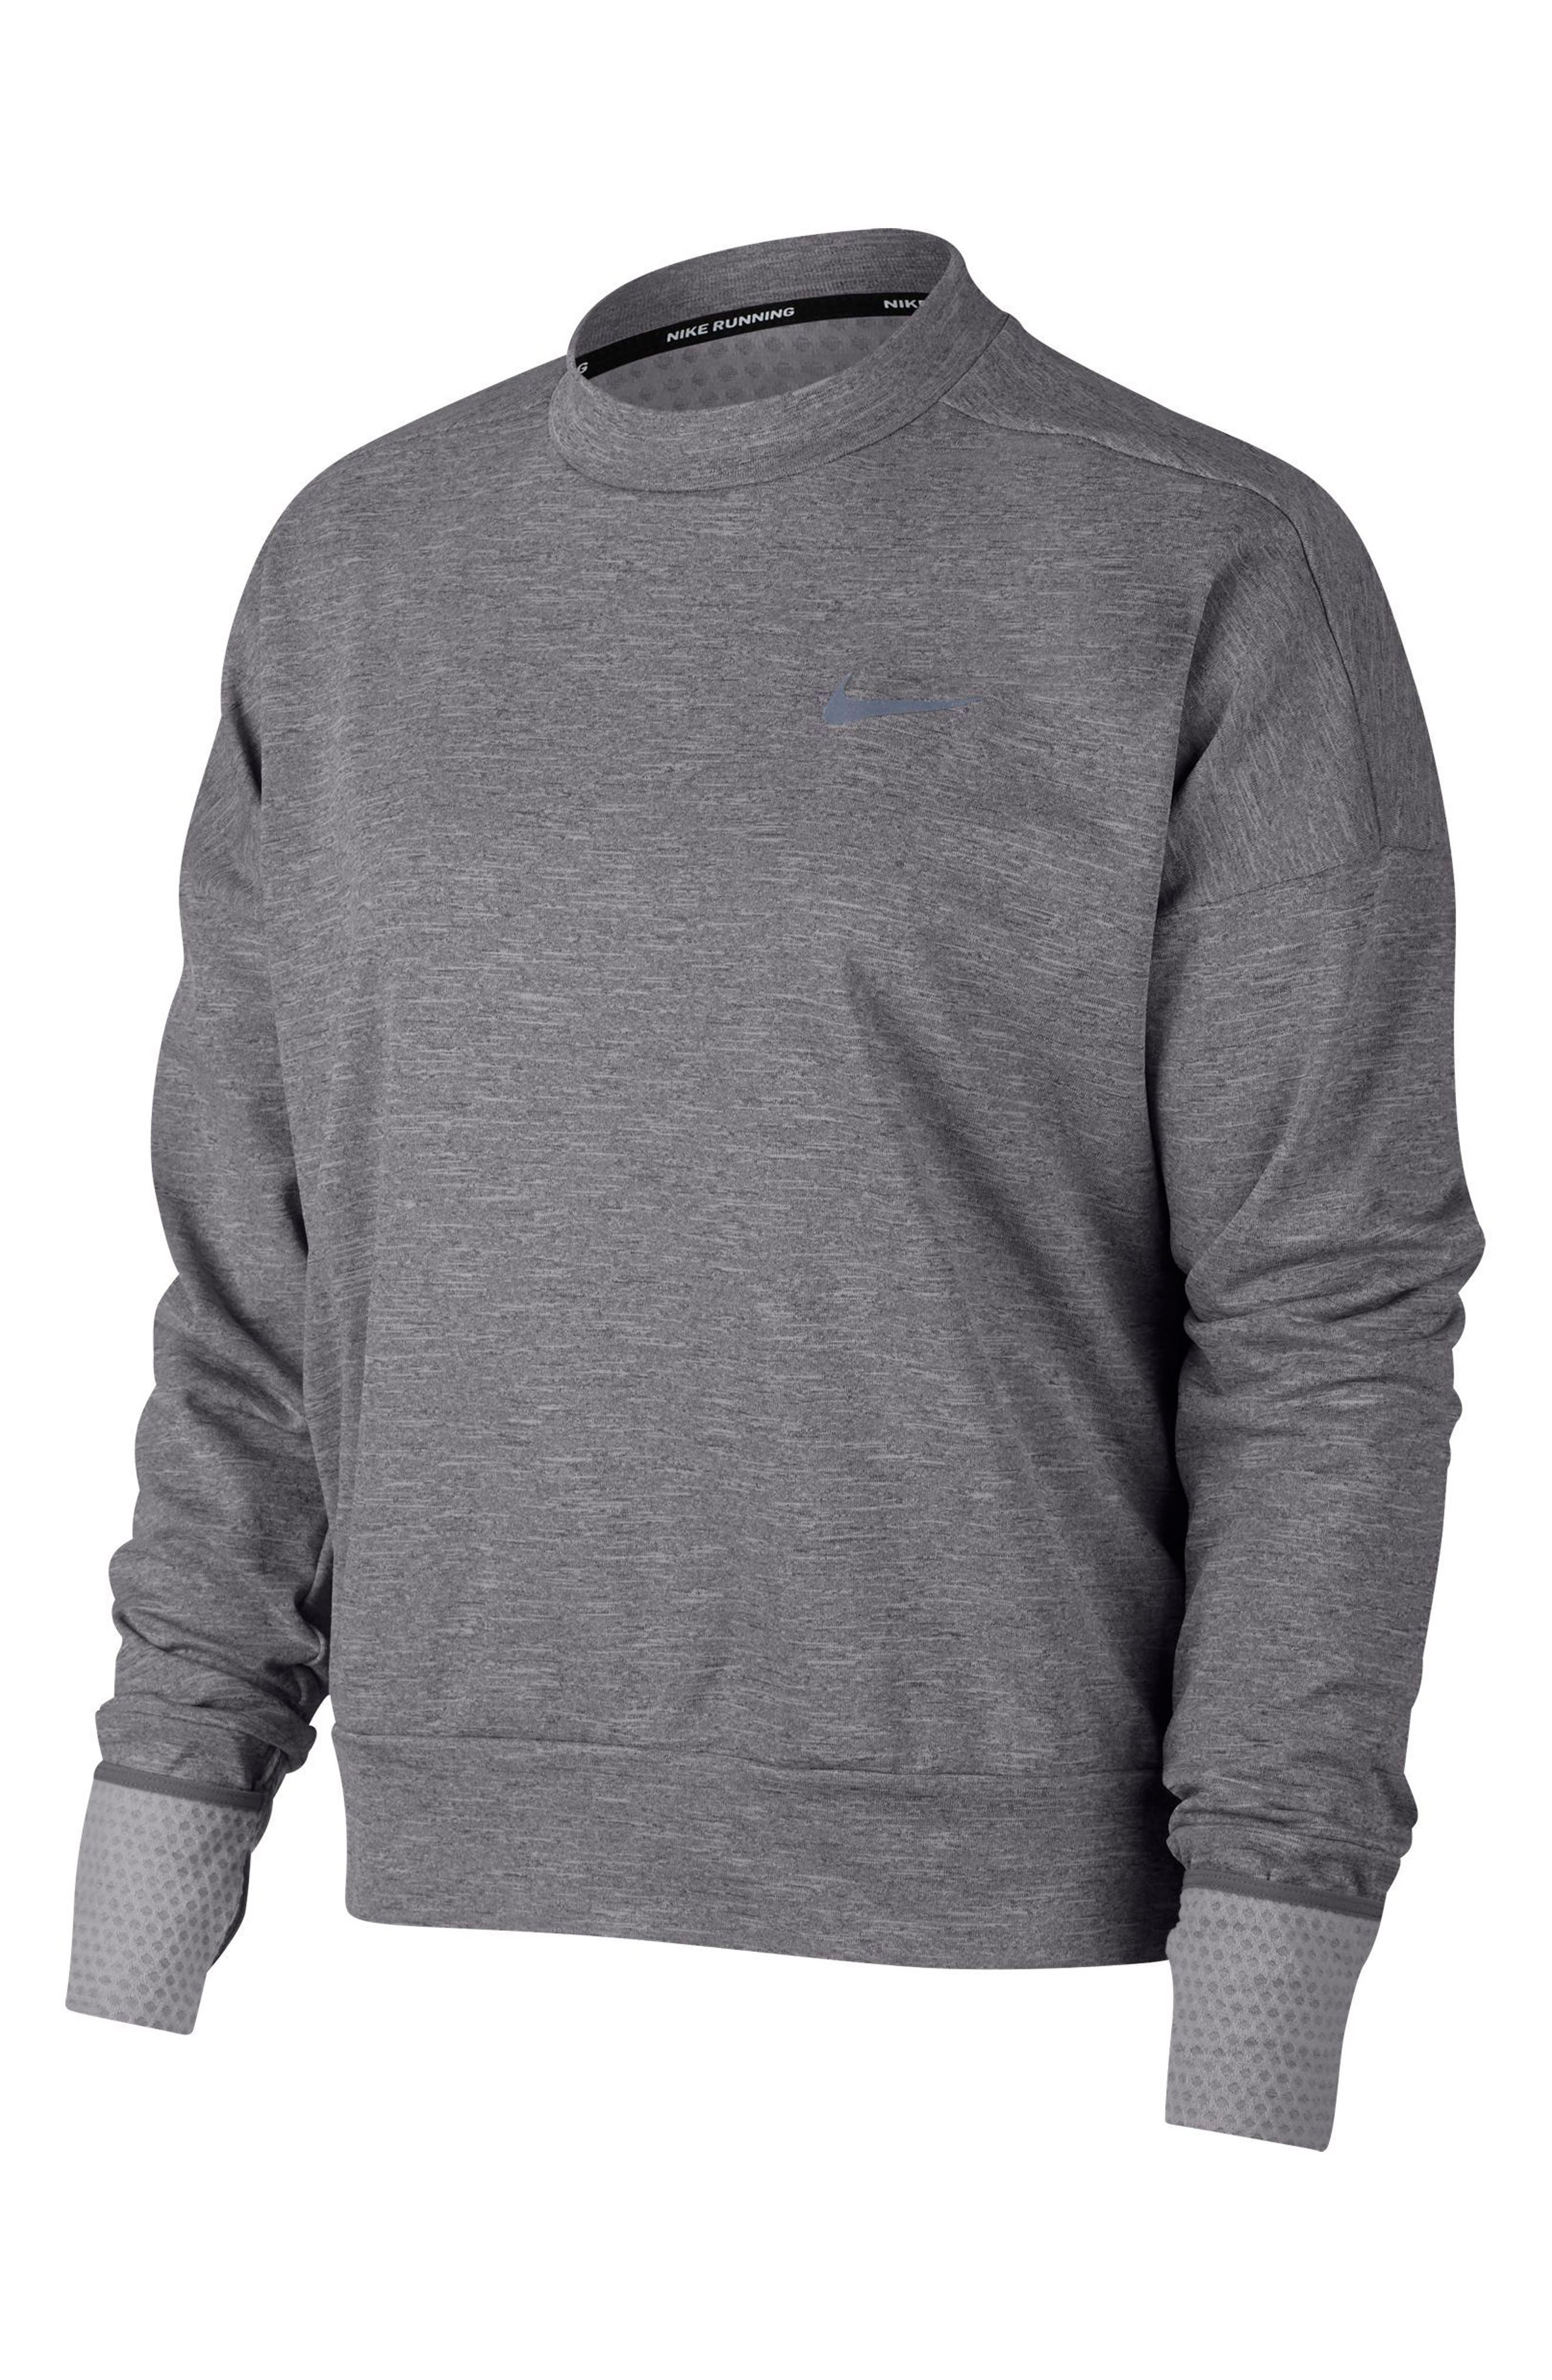 f53736320f19 Women s Nike Sweatshirts   Hoodies